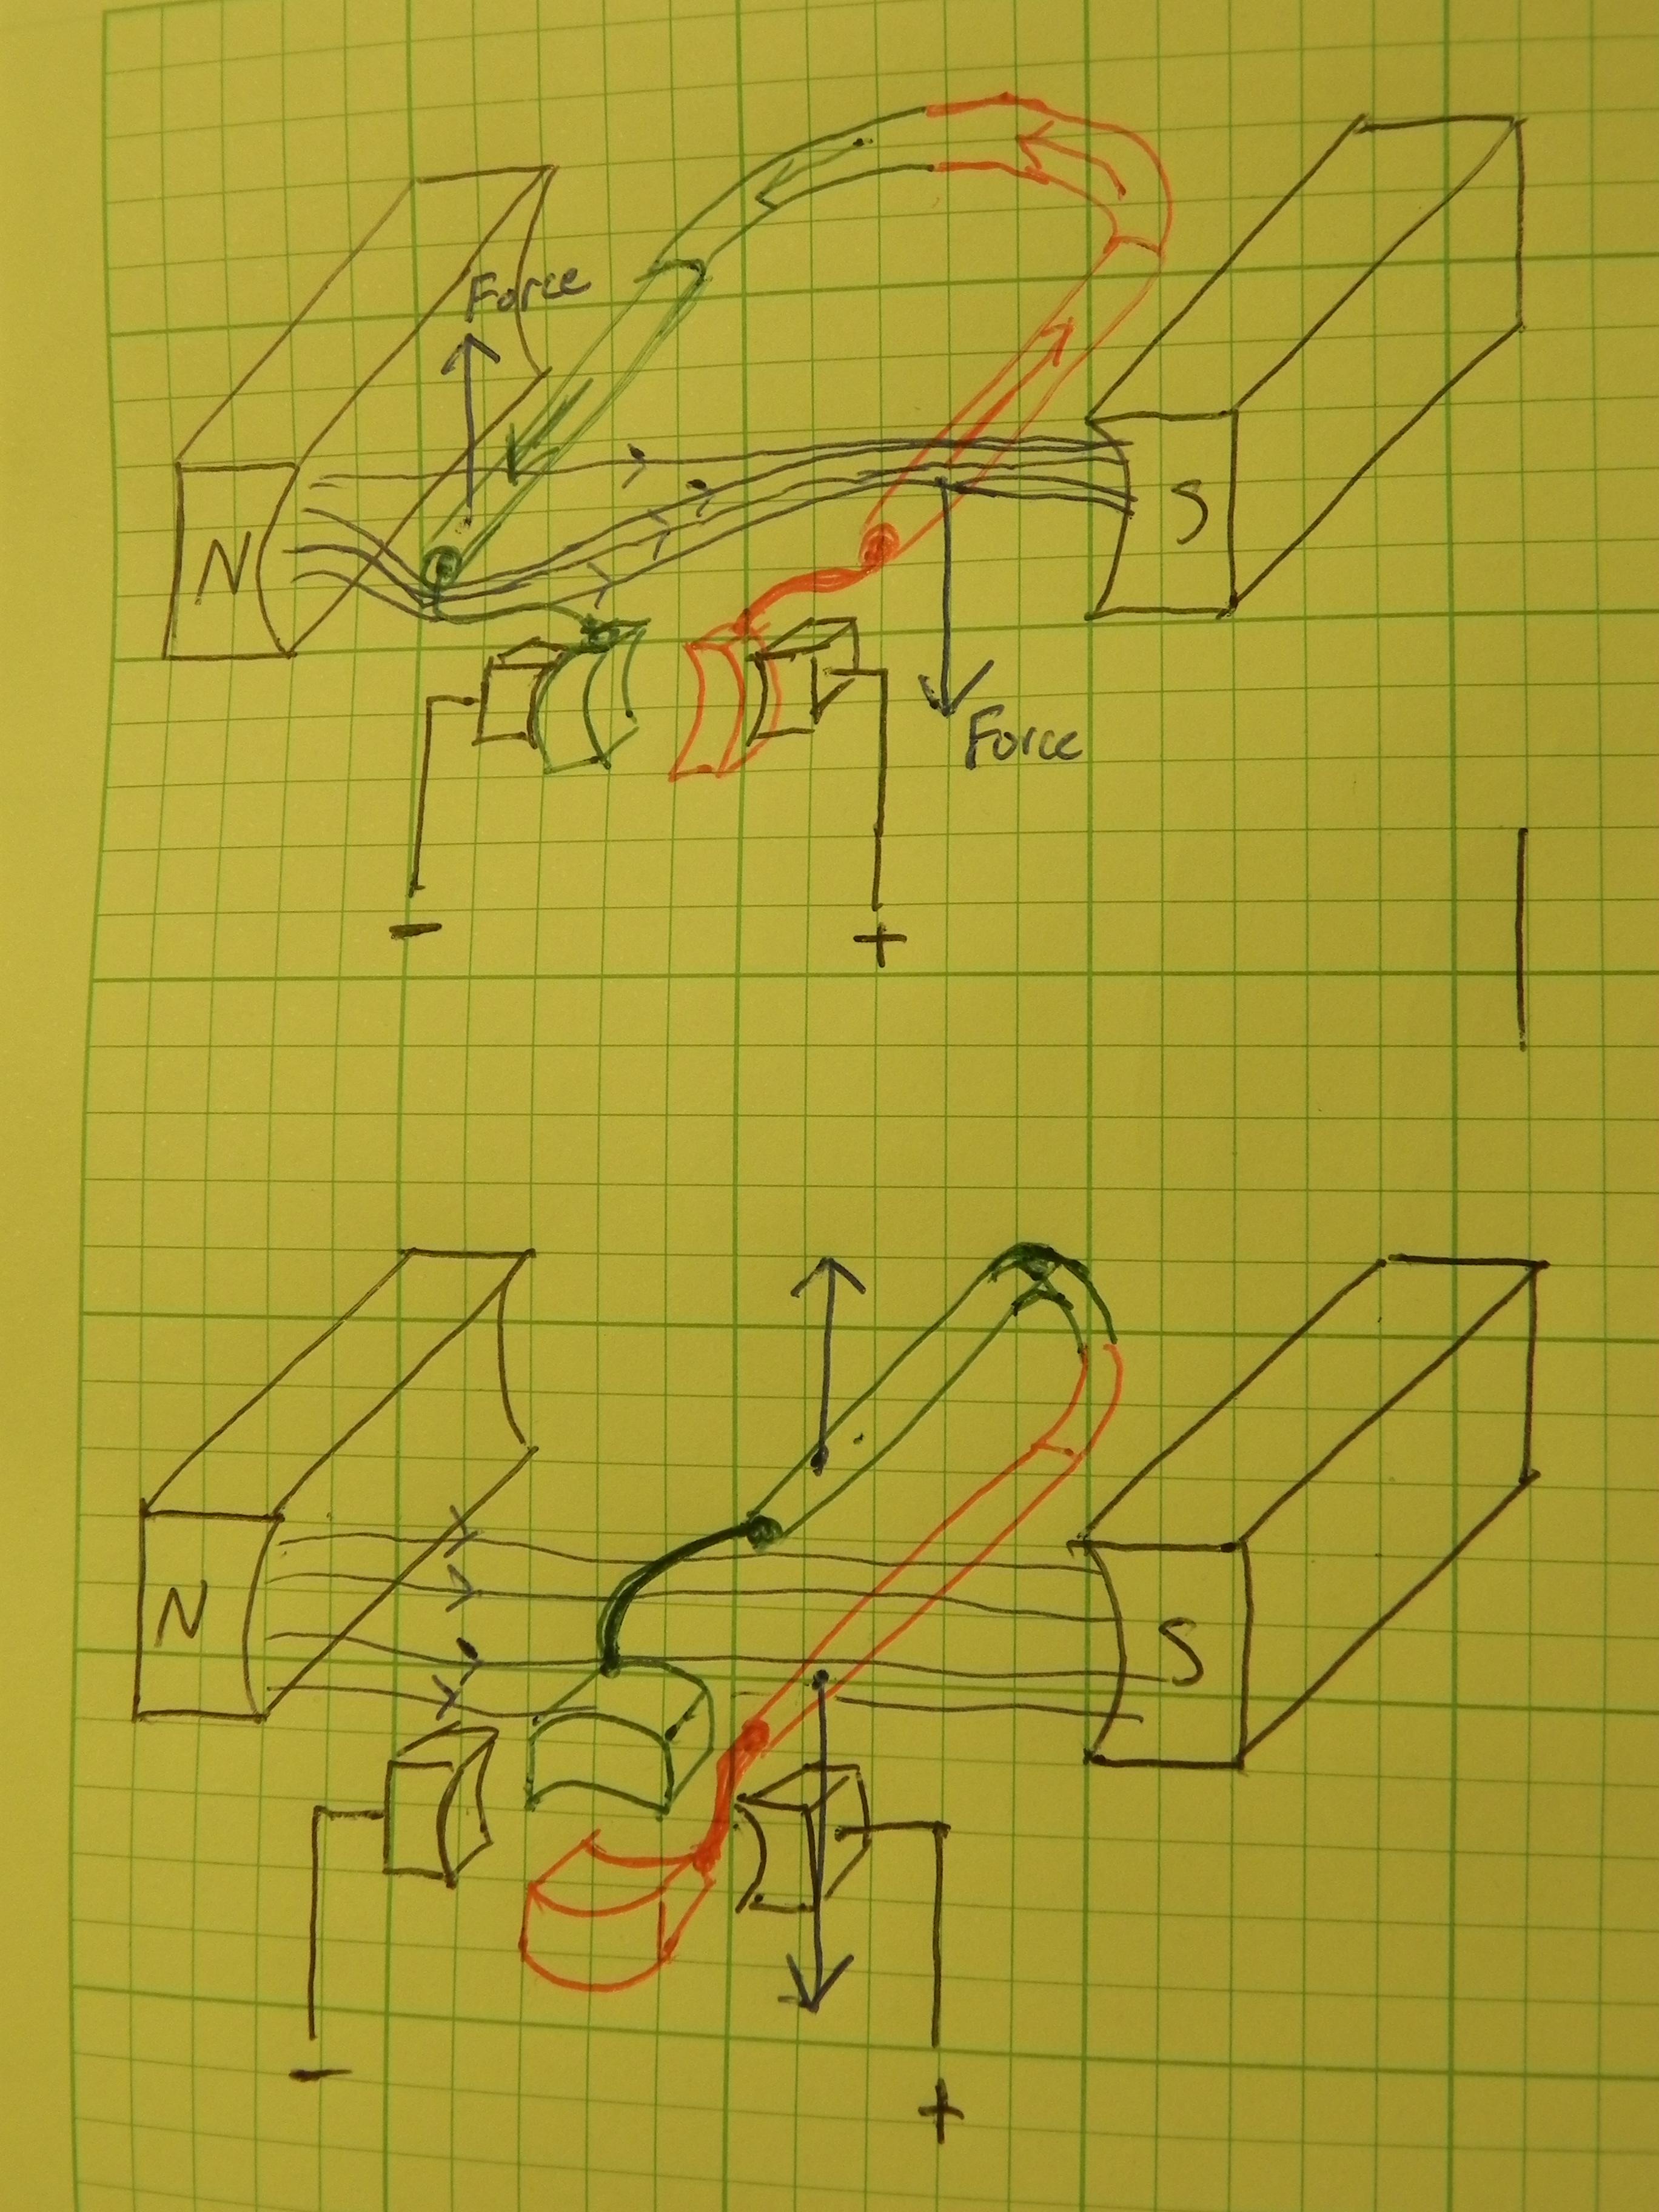 How Do Brushless Rc Motors Work Learningrc Brushlessmotorinsidediagram Brushed Motor